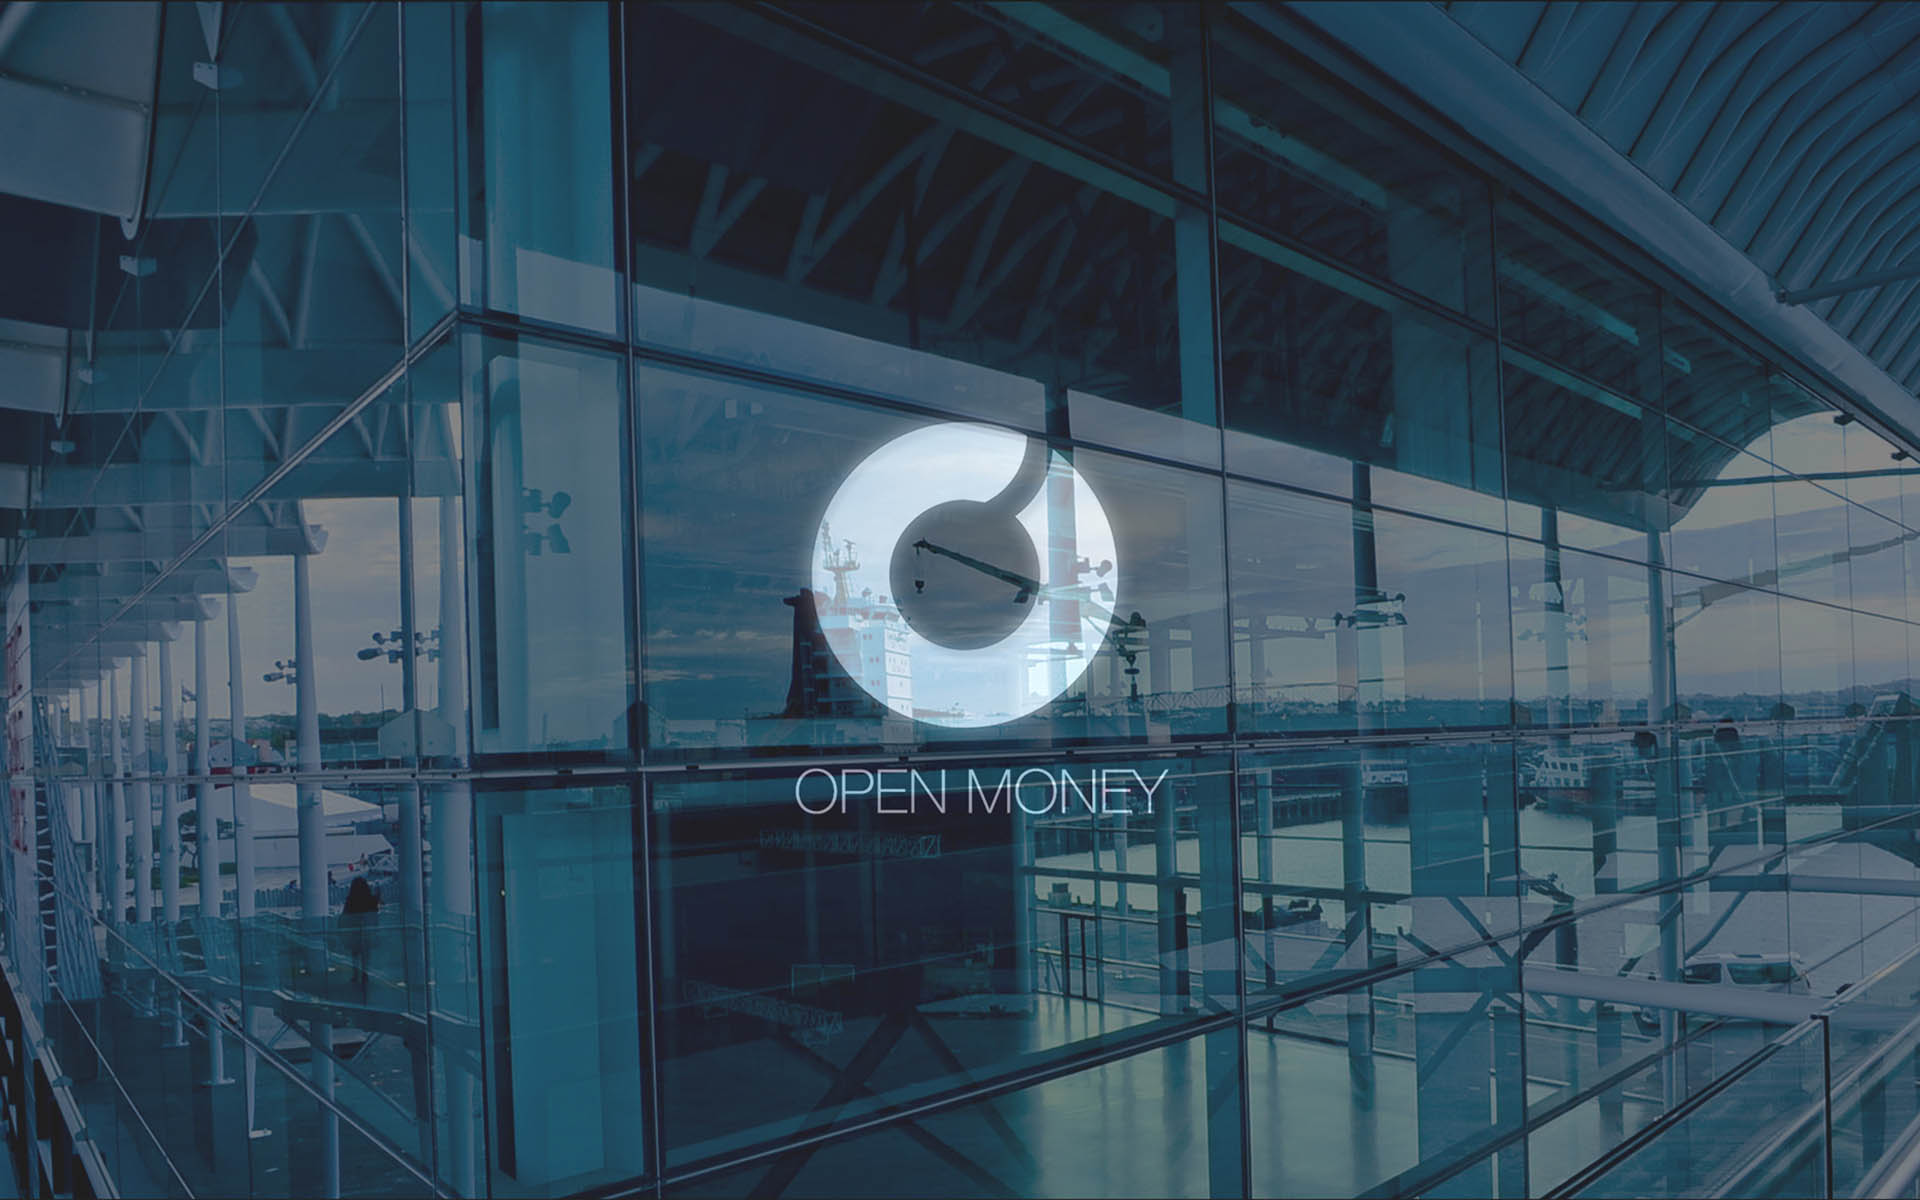 Open Money Expands Pre-Sale Due to High Demand